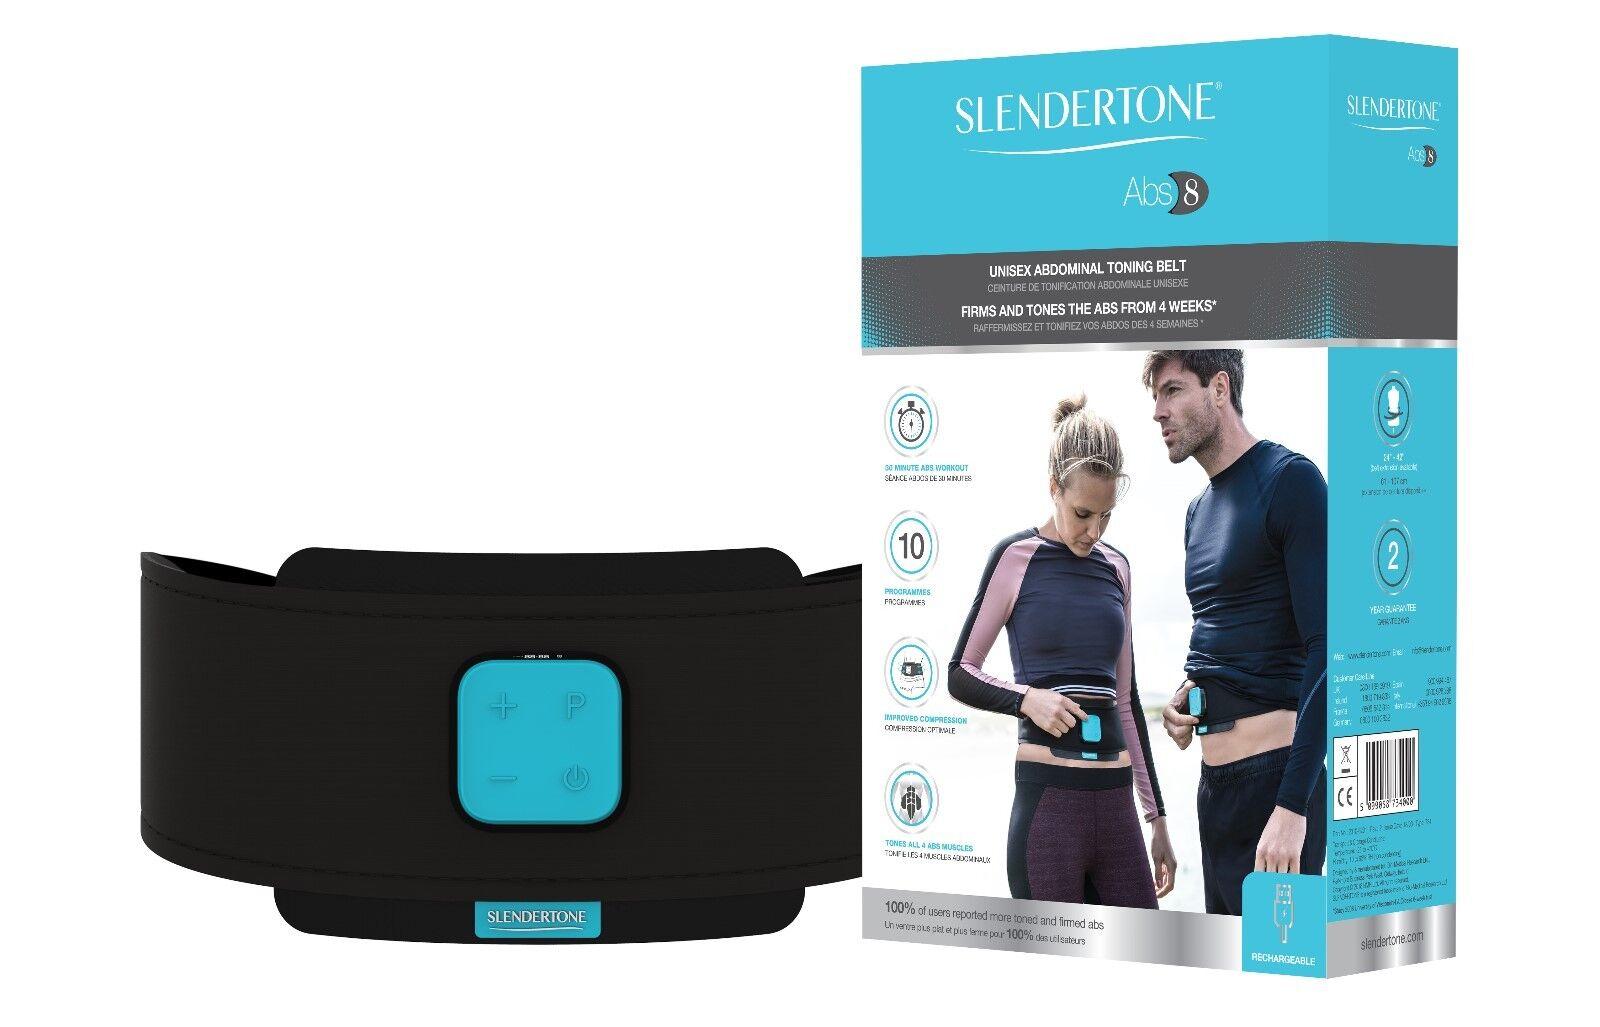 Slendertone ABS8 Unisex-Nuevo abdominal Toning Belt-Li-ion Recargable RRP